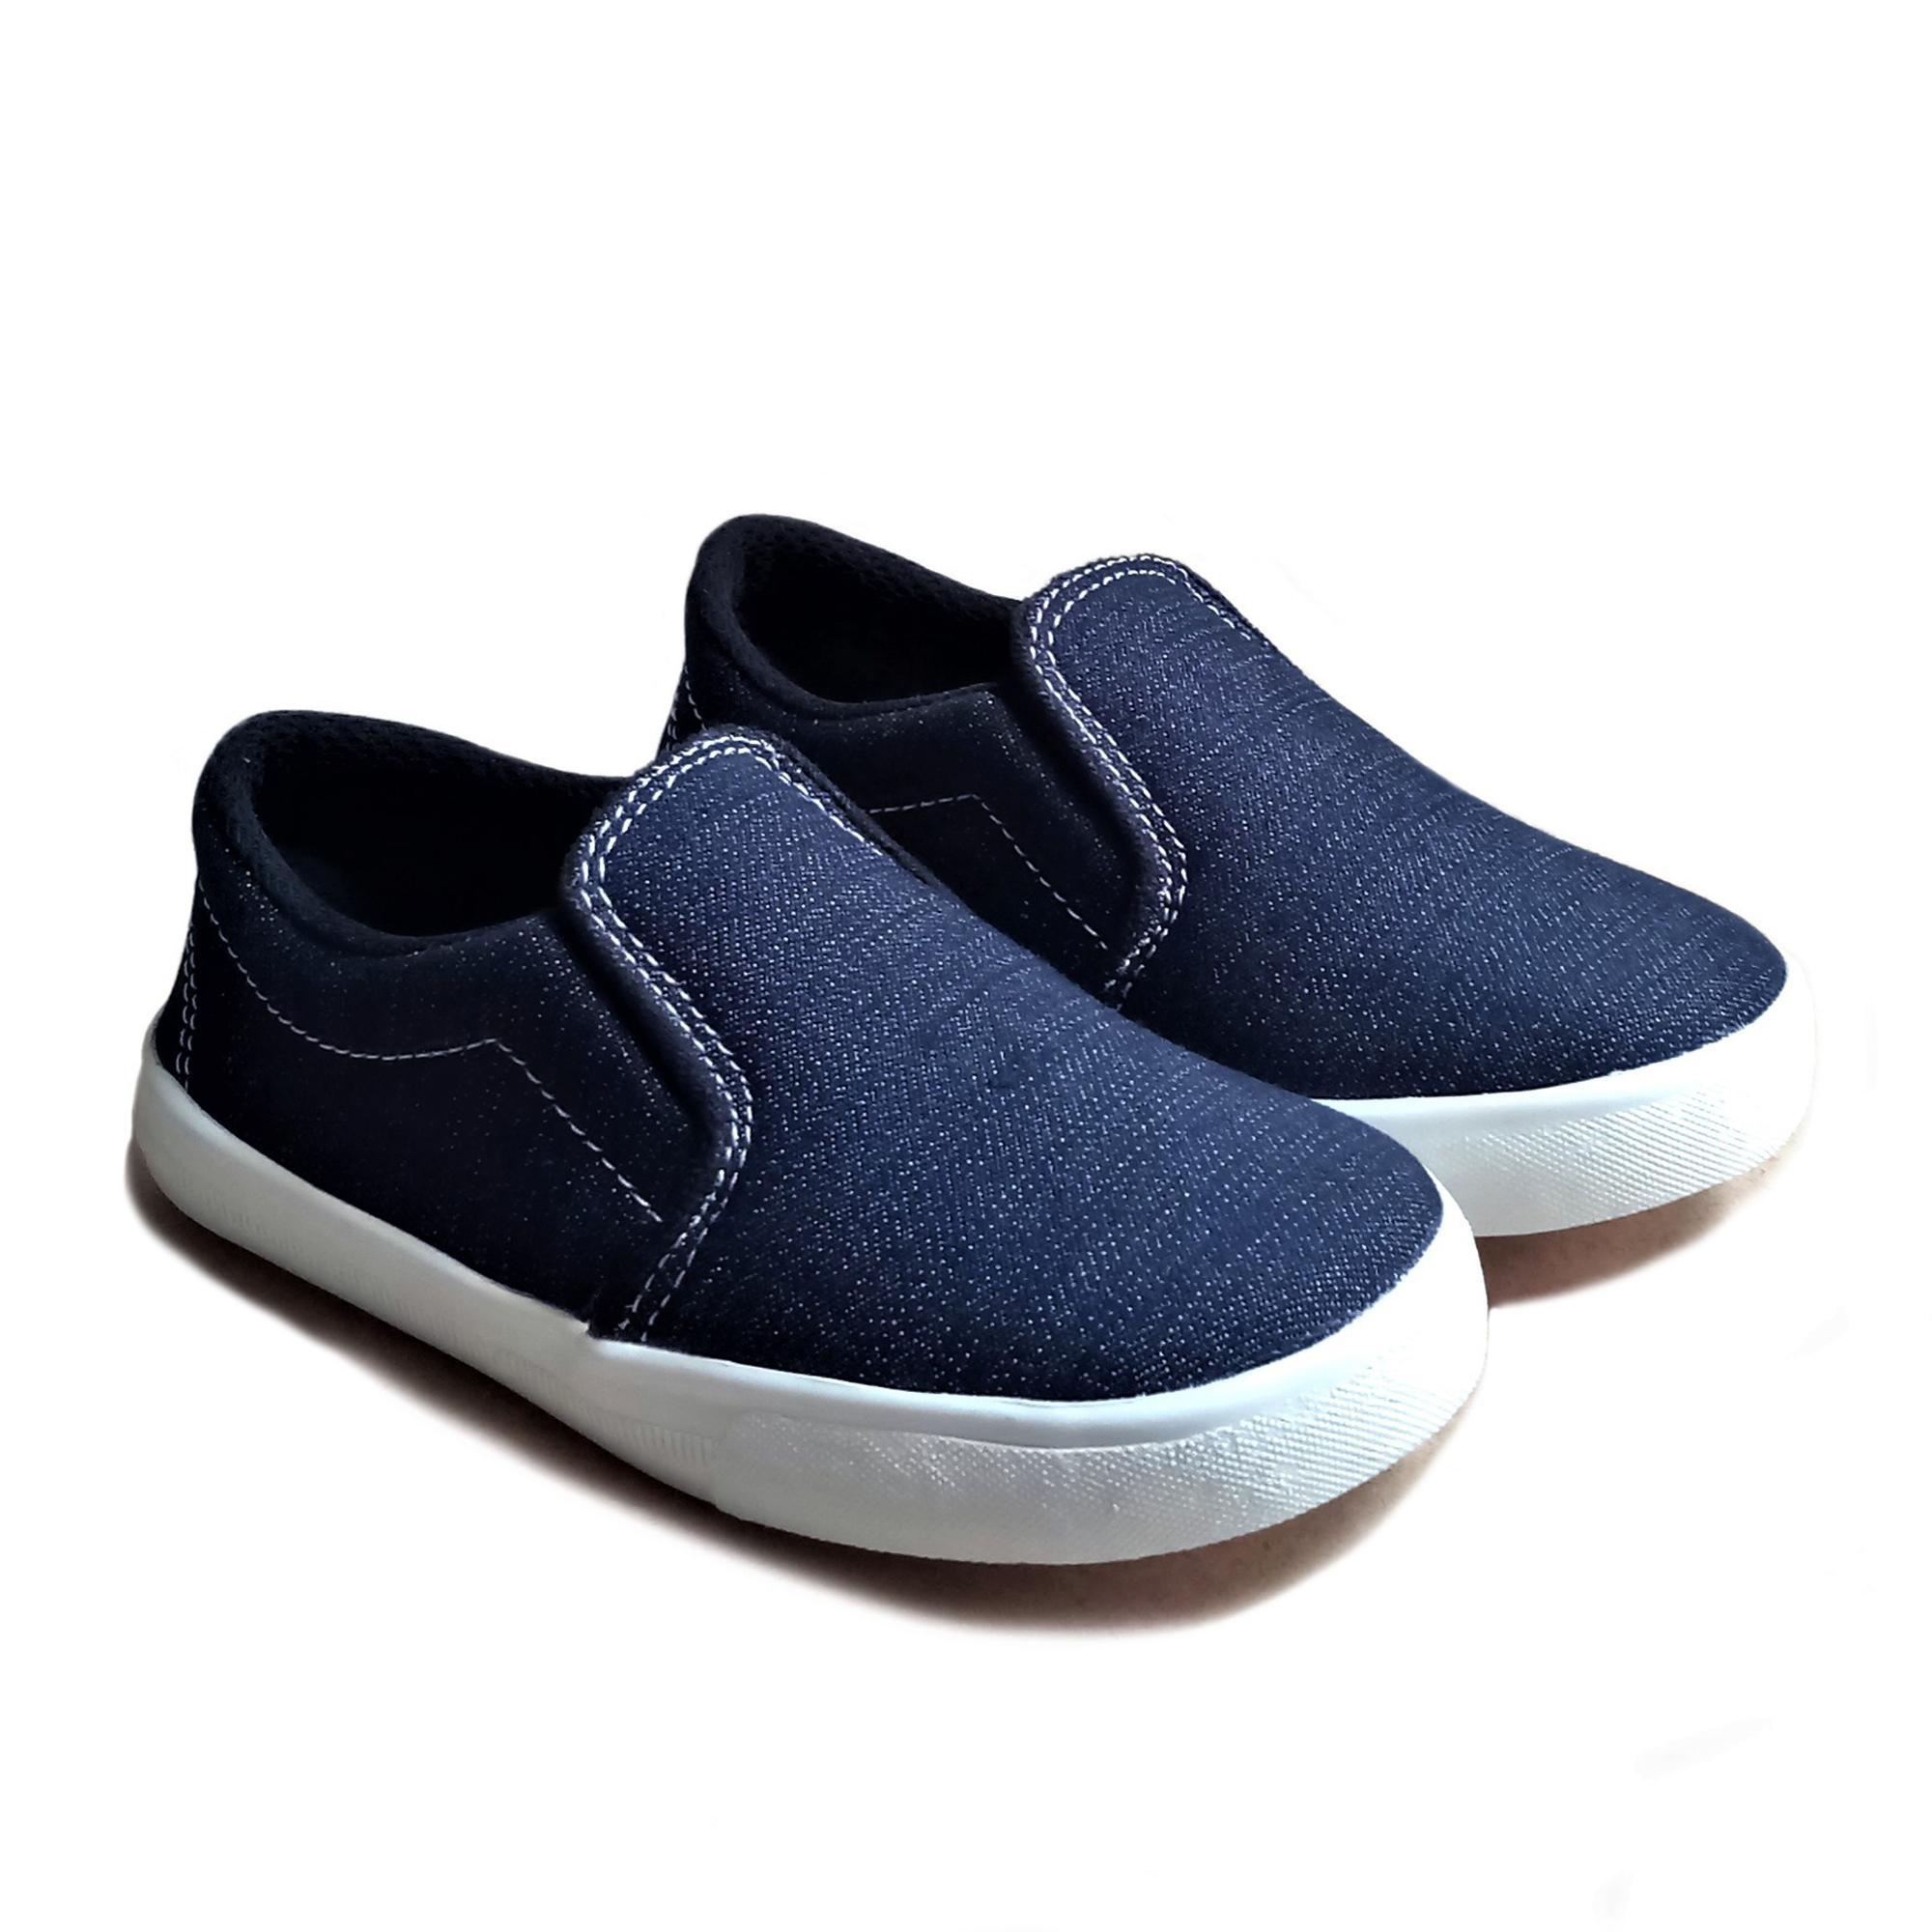 Sepatu Slip On Anak Laki Sandal Balita Perempuan Bayi Dan Cewek  Mickey Seven Denim Mgn